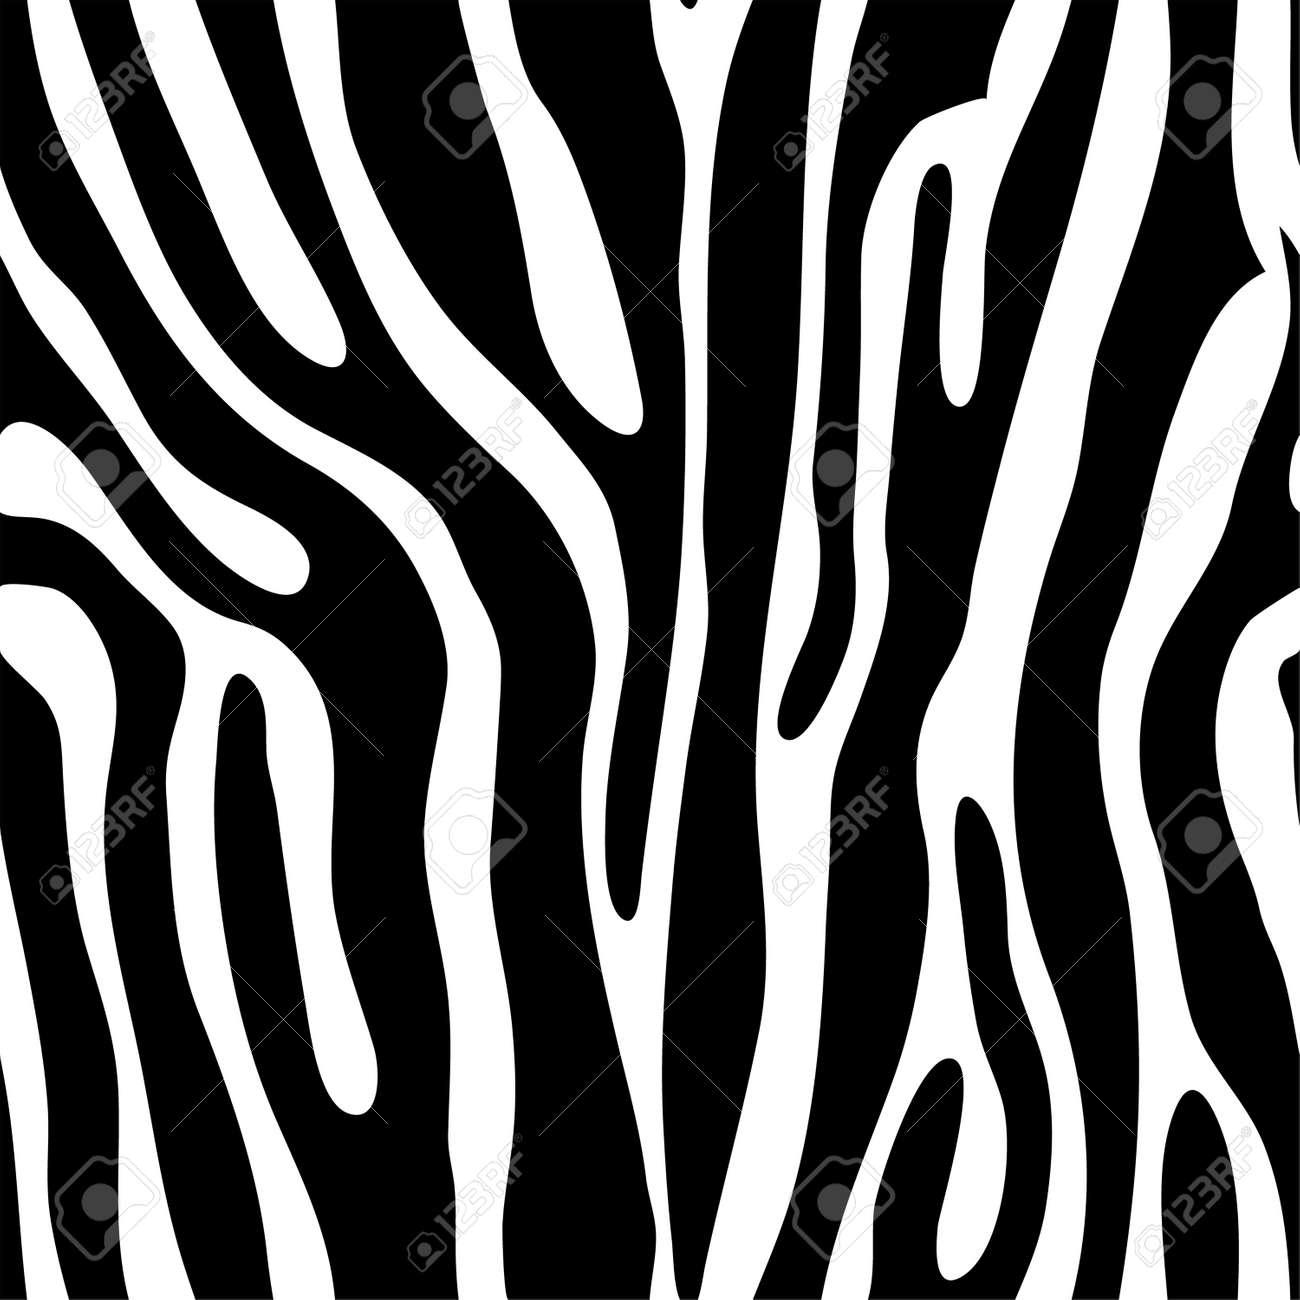 Image of: Zebra Skin Seamless Tiling Animal Print Zebra Vector Illustration Stock Vector 8985548 123rfcom Seamless Tiling Animal Print Zebra Vector Illustration Royalty Free